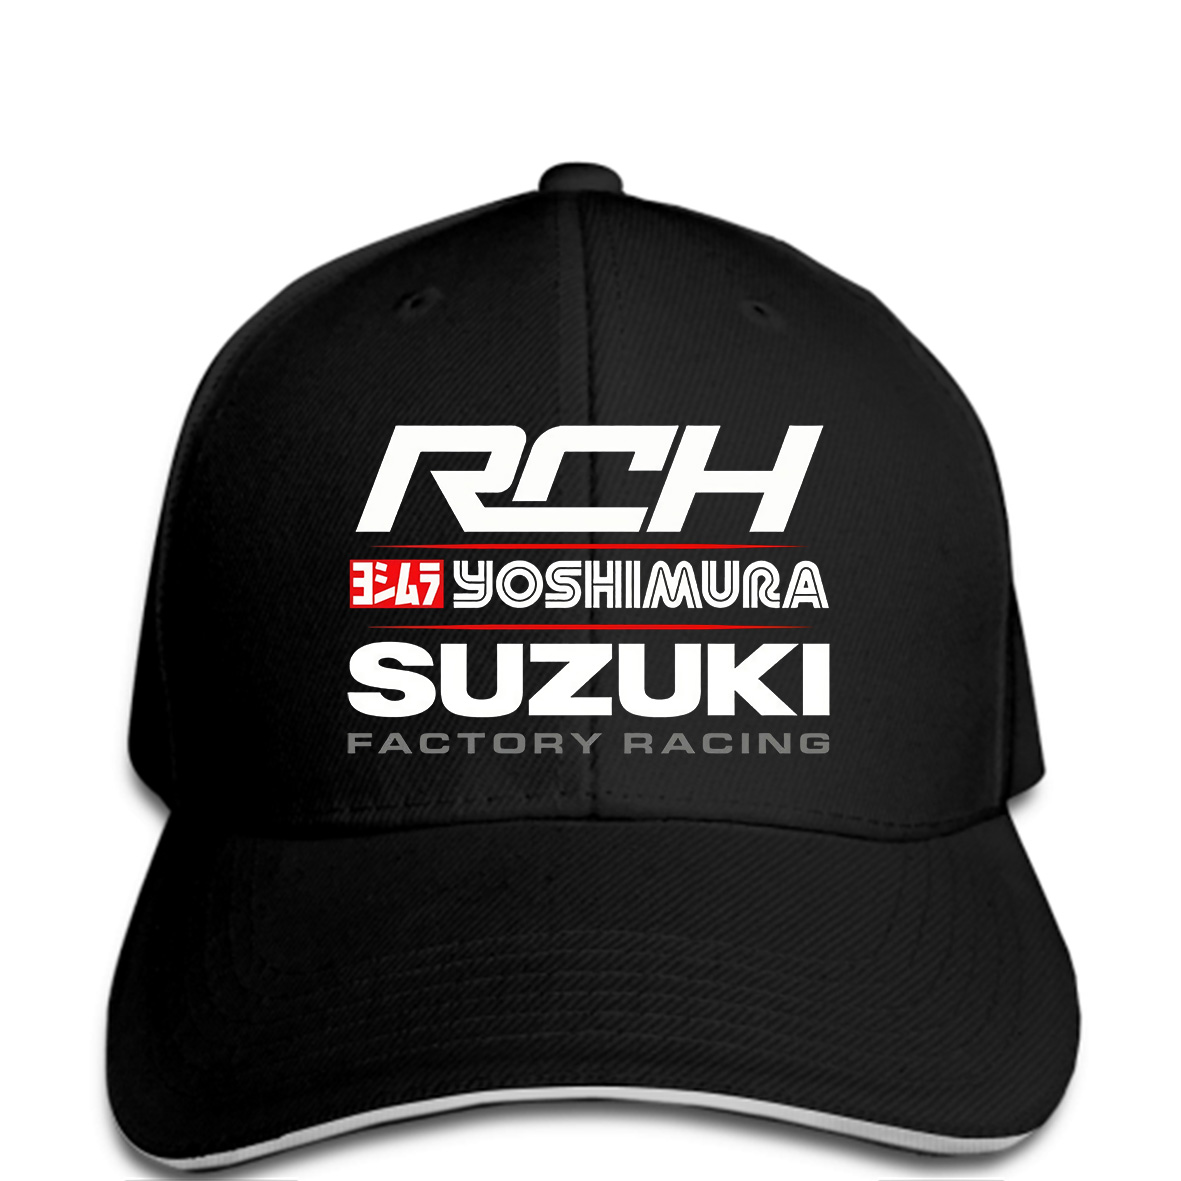 Suzuki Yoshimura Racing snapback Suzuki Hat Suzuki Rch Factory Racing Hat  Mens Fashion Casual Hat Baseball cap Cool-in Baseball Caps from Apparel ... 4a83e21d357